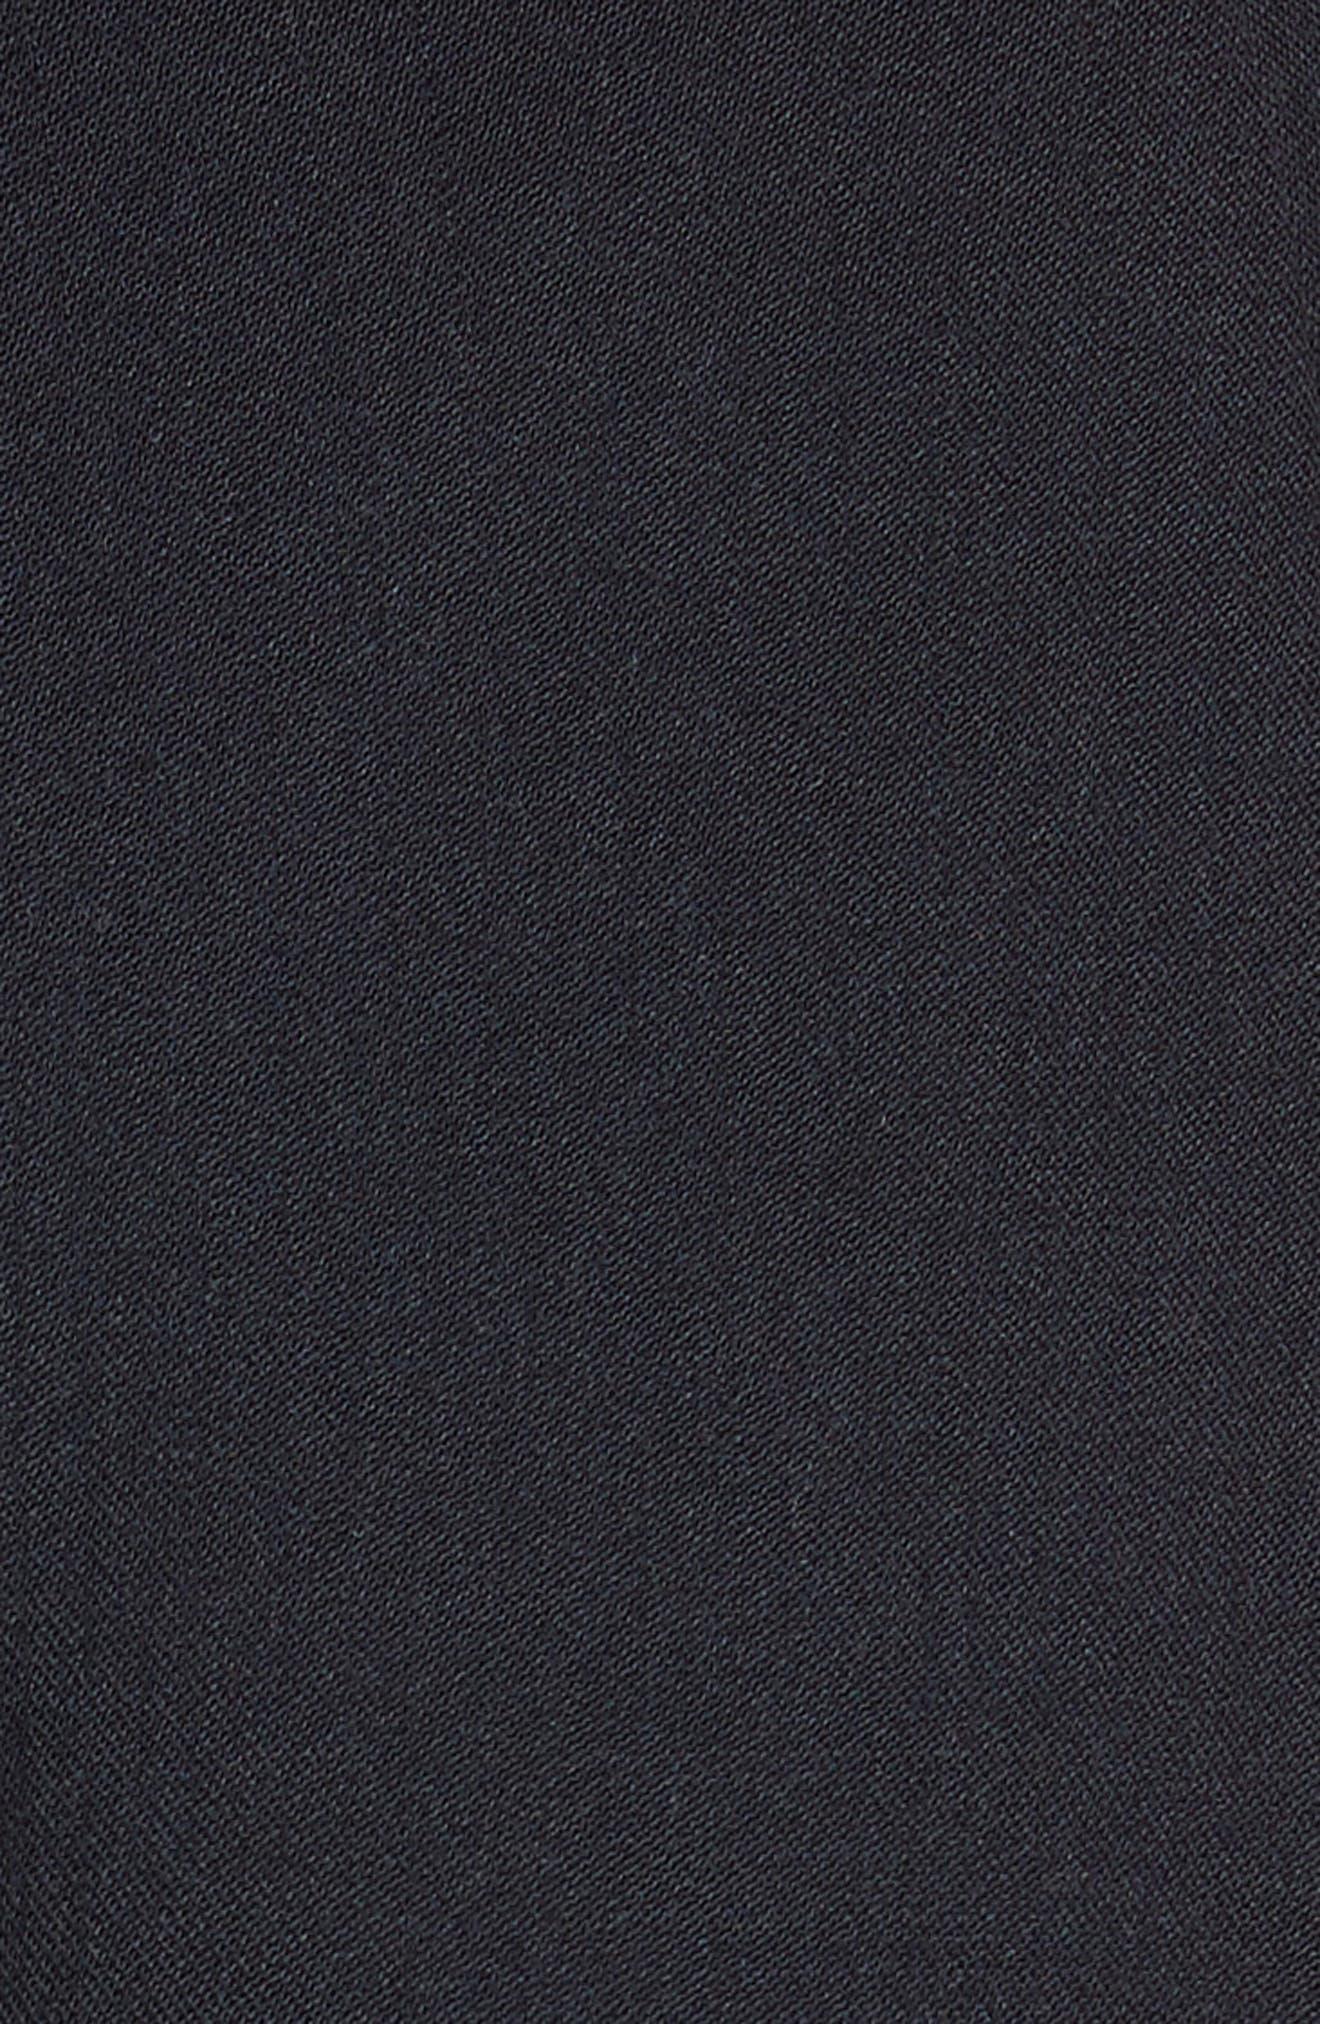 Alternate Image 5  - Milly Italian Gabardine Trapunto Trousers